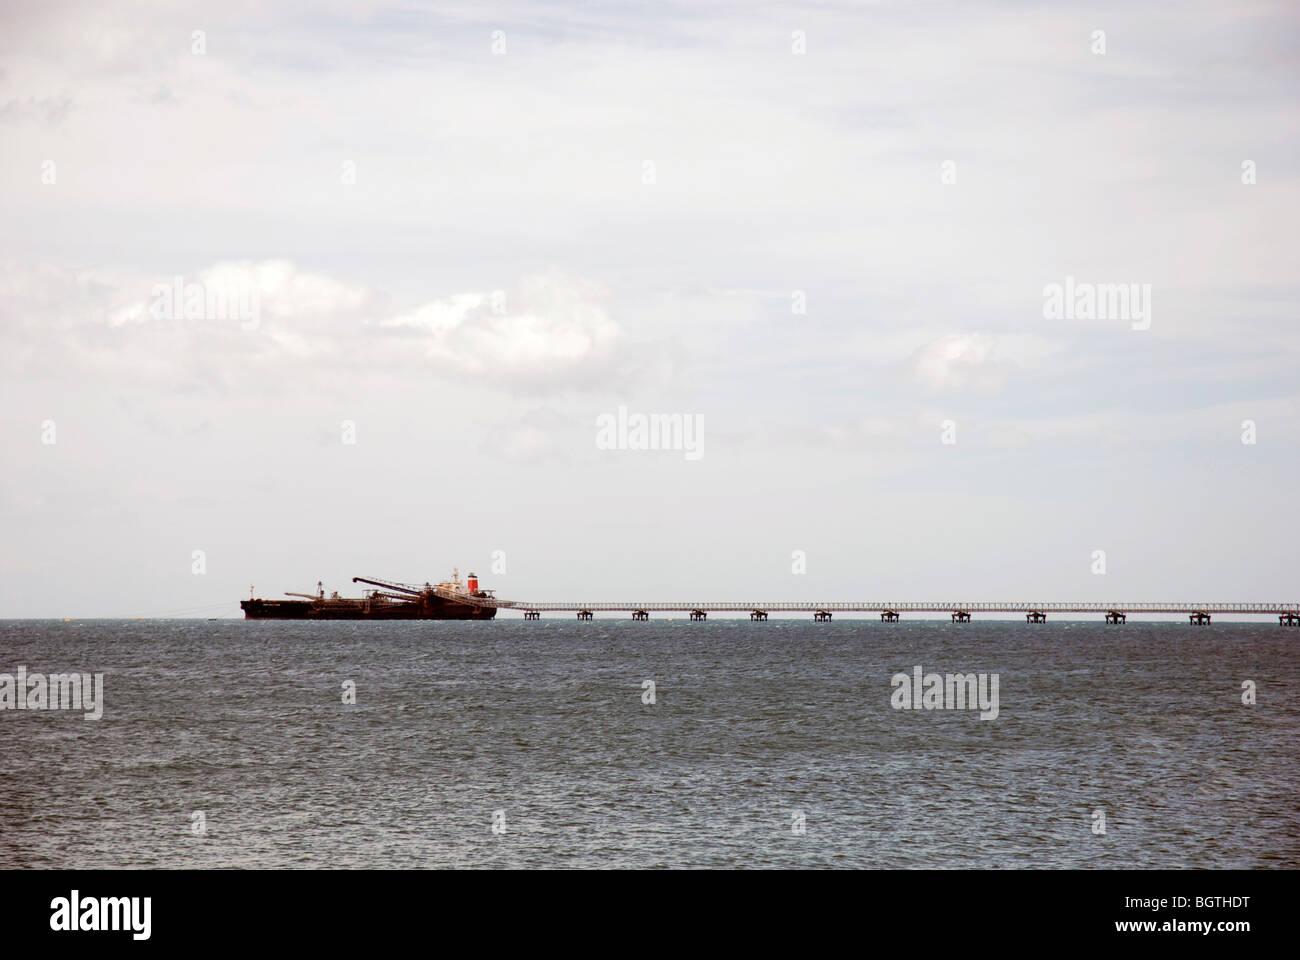 Bulk minerals cargo ship at Port Latta on the North West coast of Tasmania - Stock Image